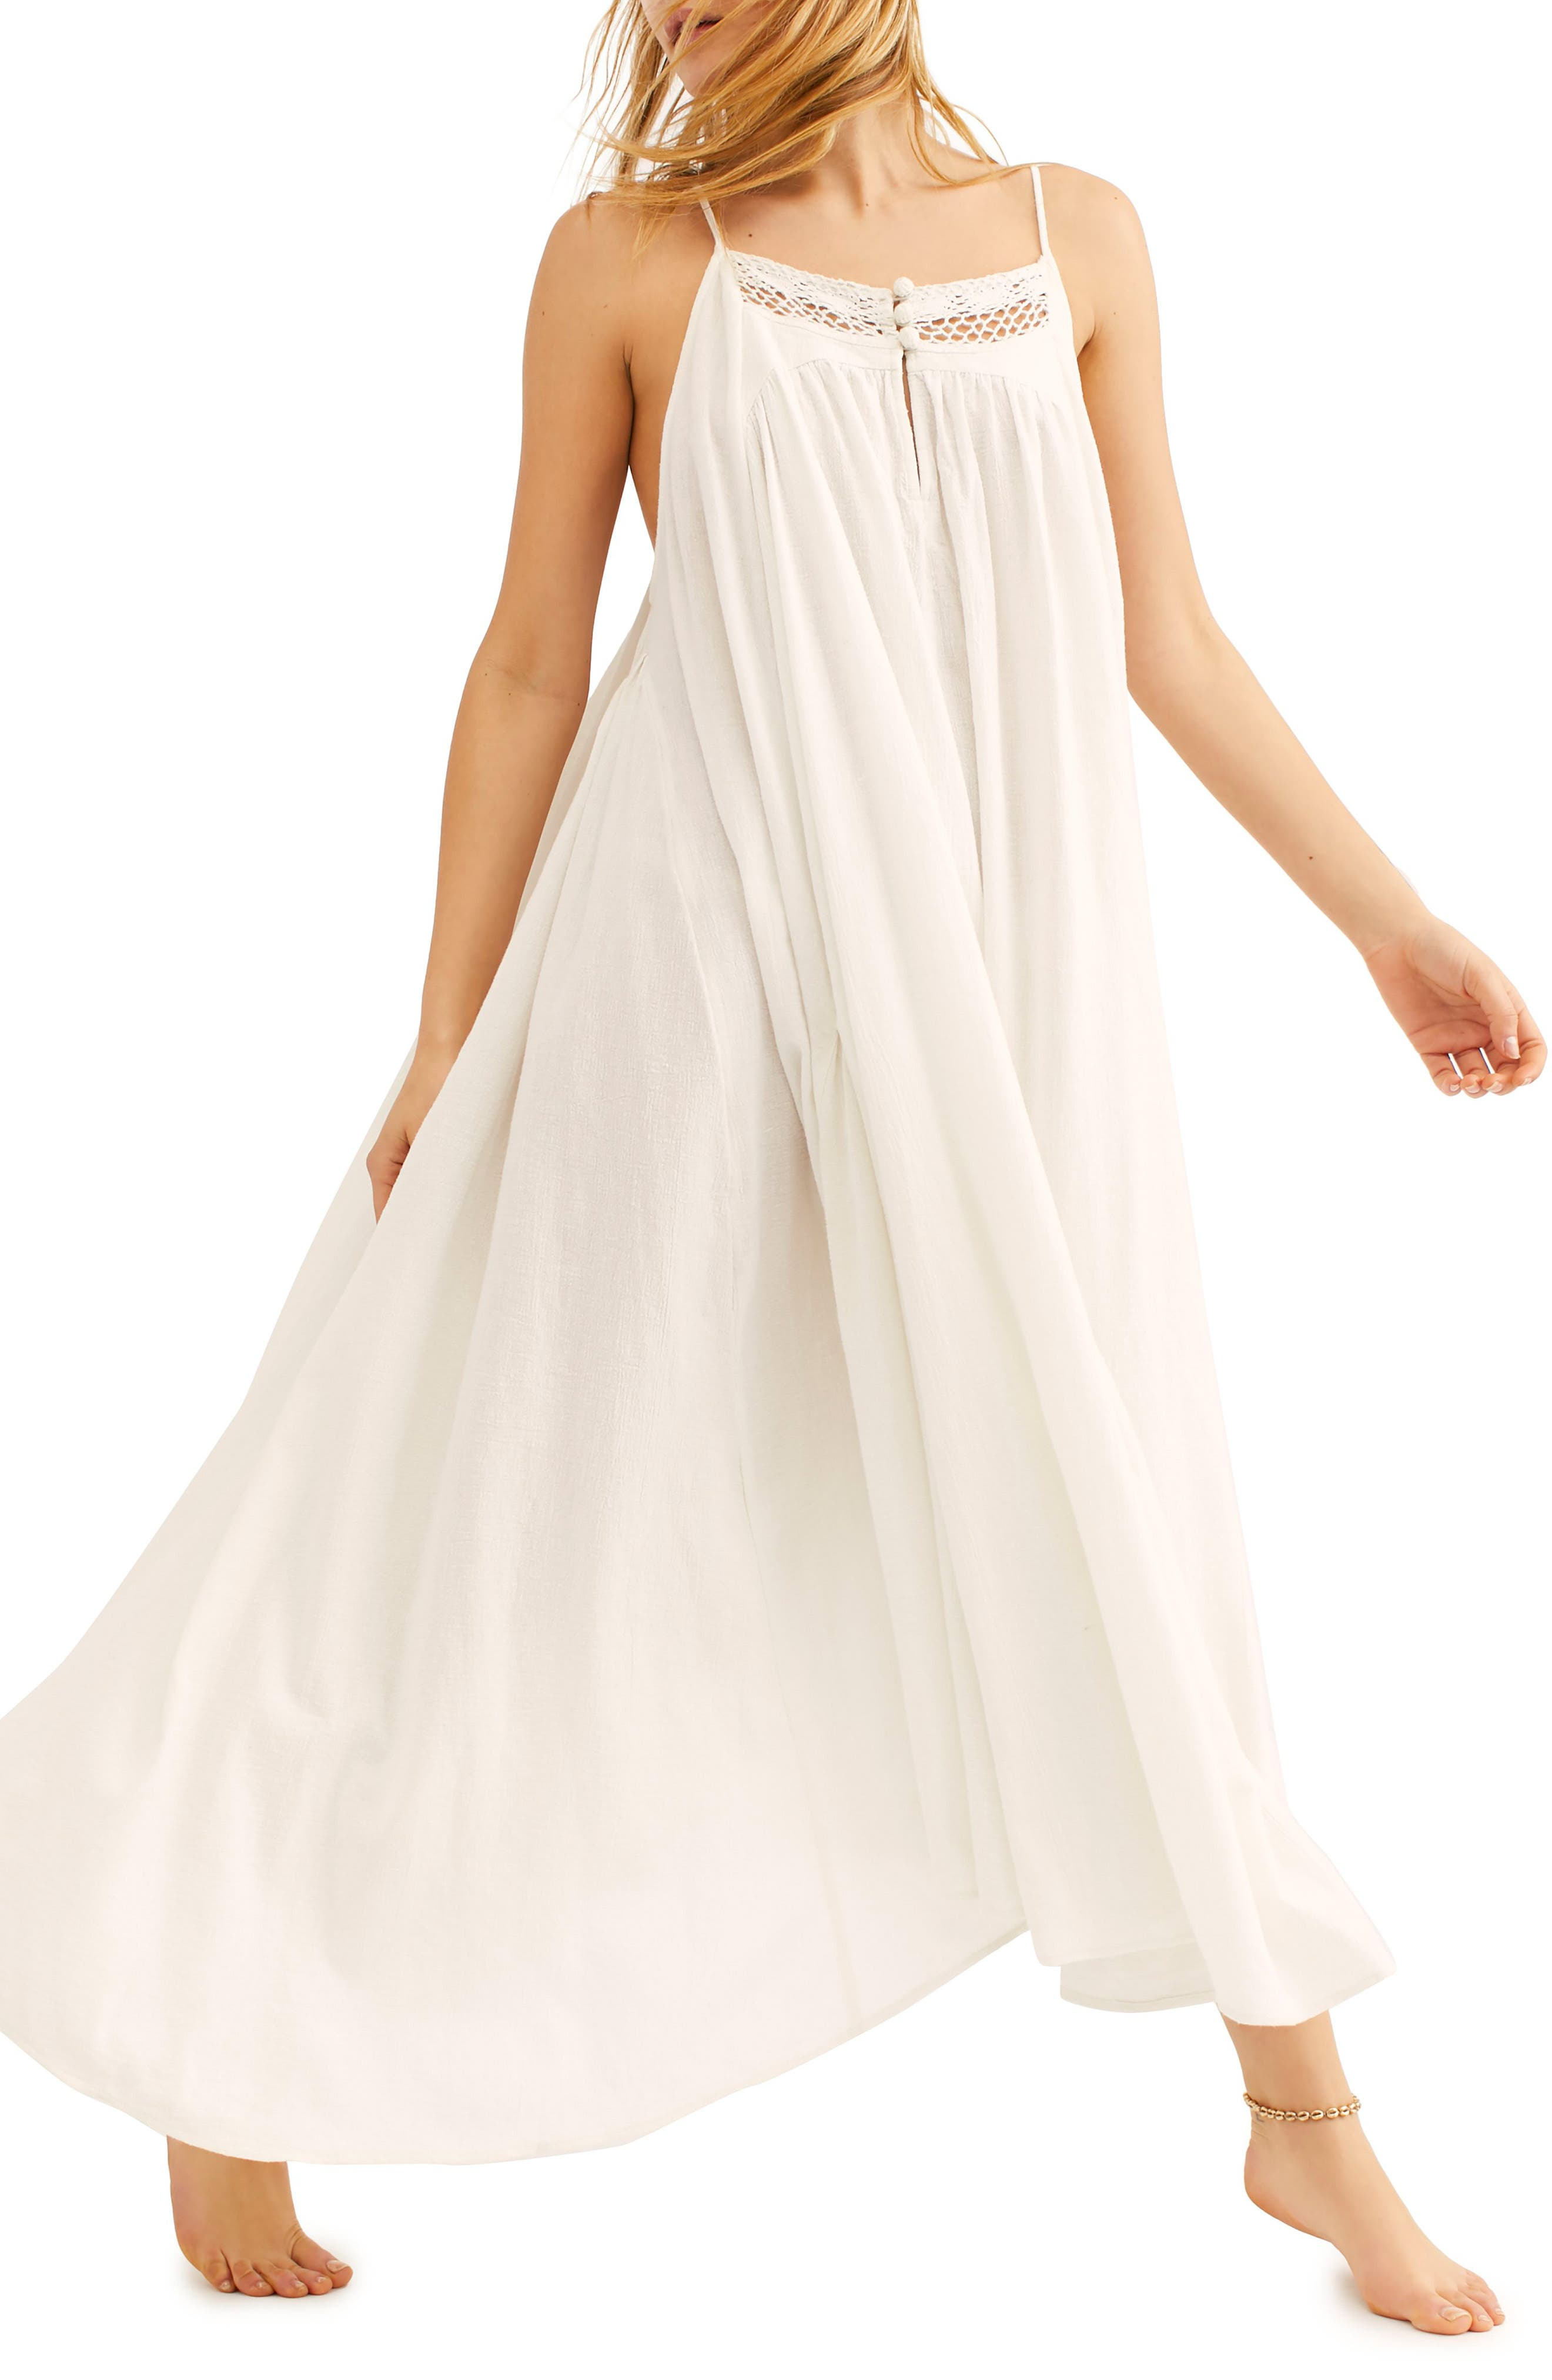 Endless Summer By Free People Mancora Maxi Dress, Ivory